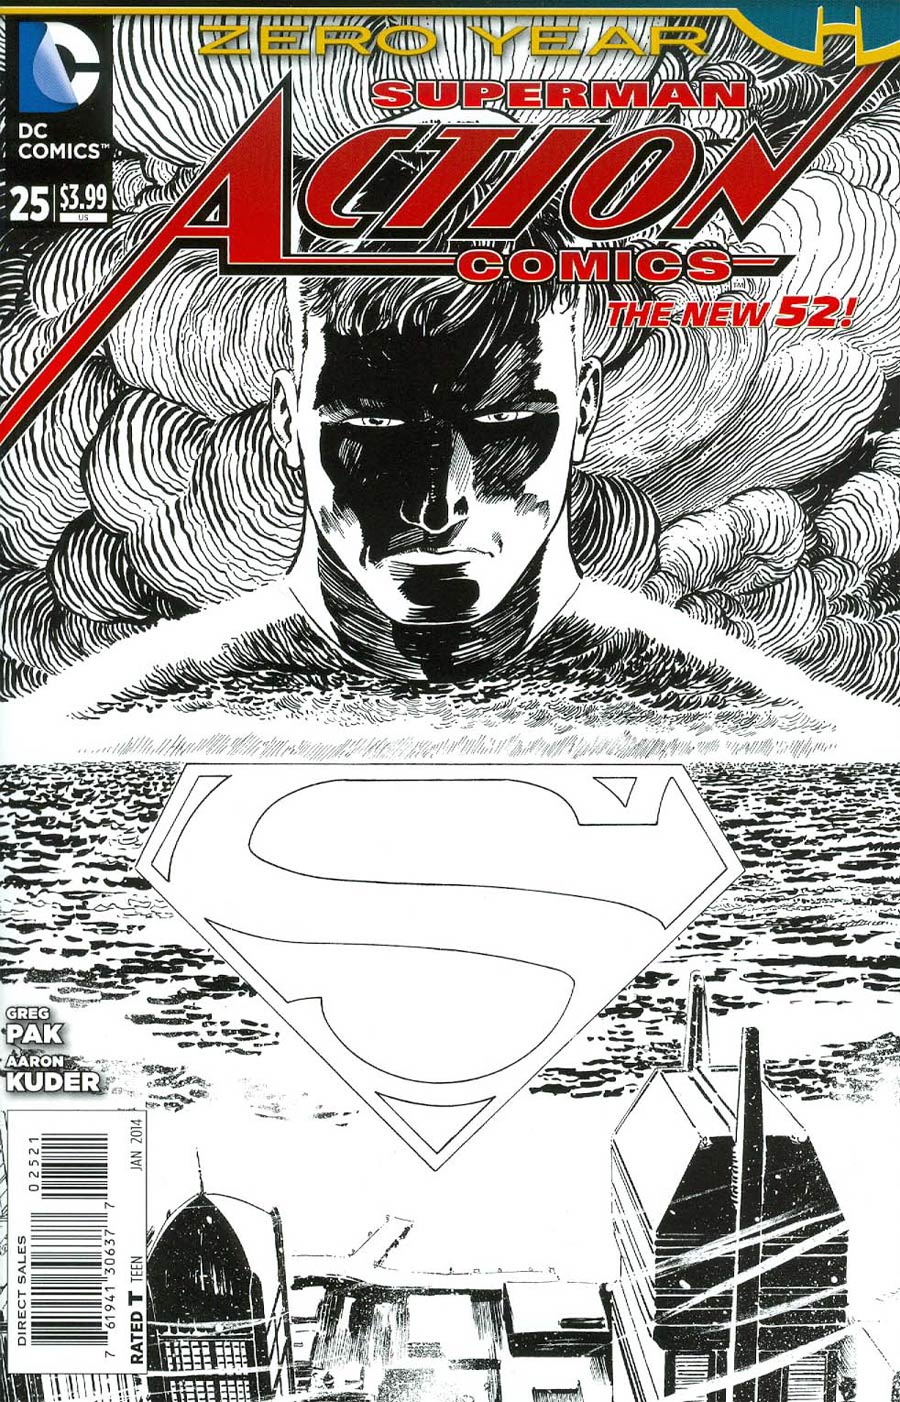 Action Comics Vol 2 #25 Cover B Incentive Aaron Kuder Sketch Cover (Batman Zero Year Tie-In)